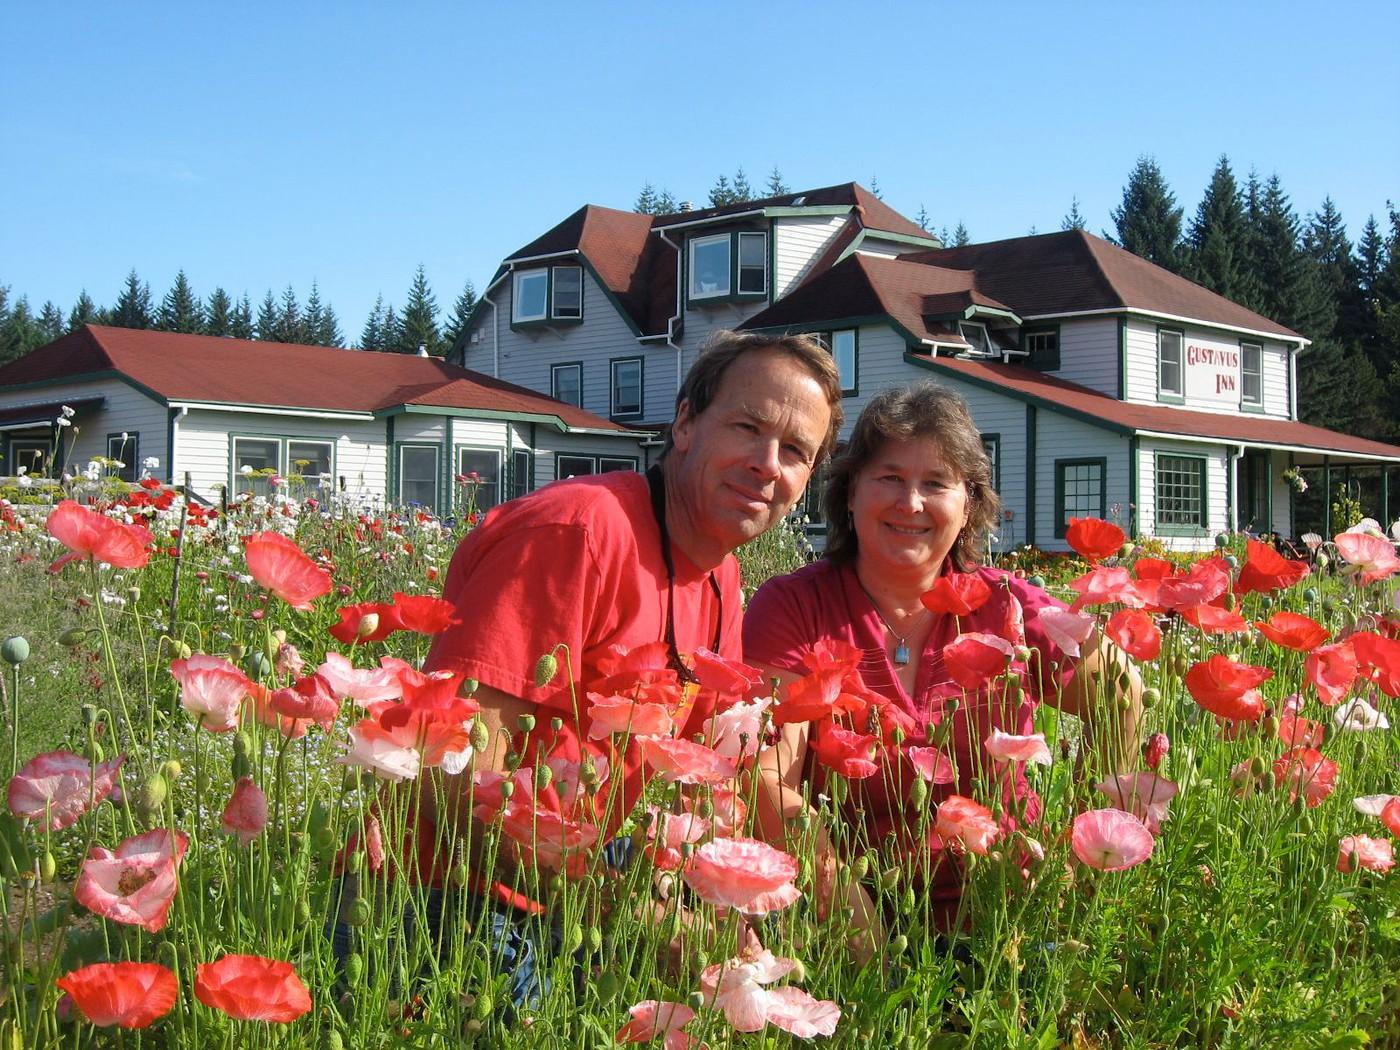 Innkeepers Dave and JoAnn Lesh